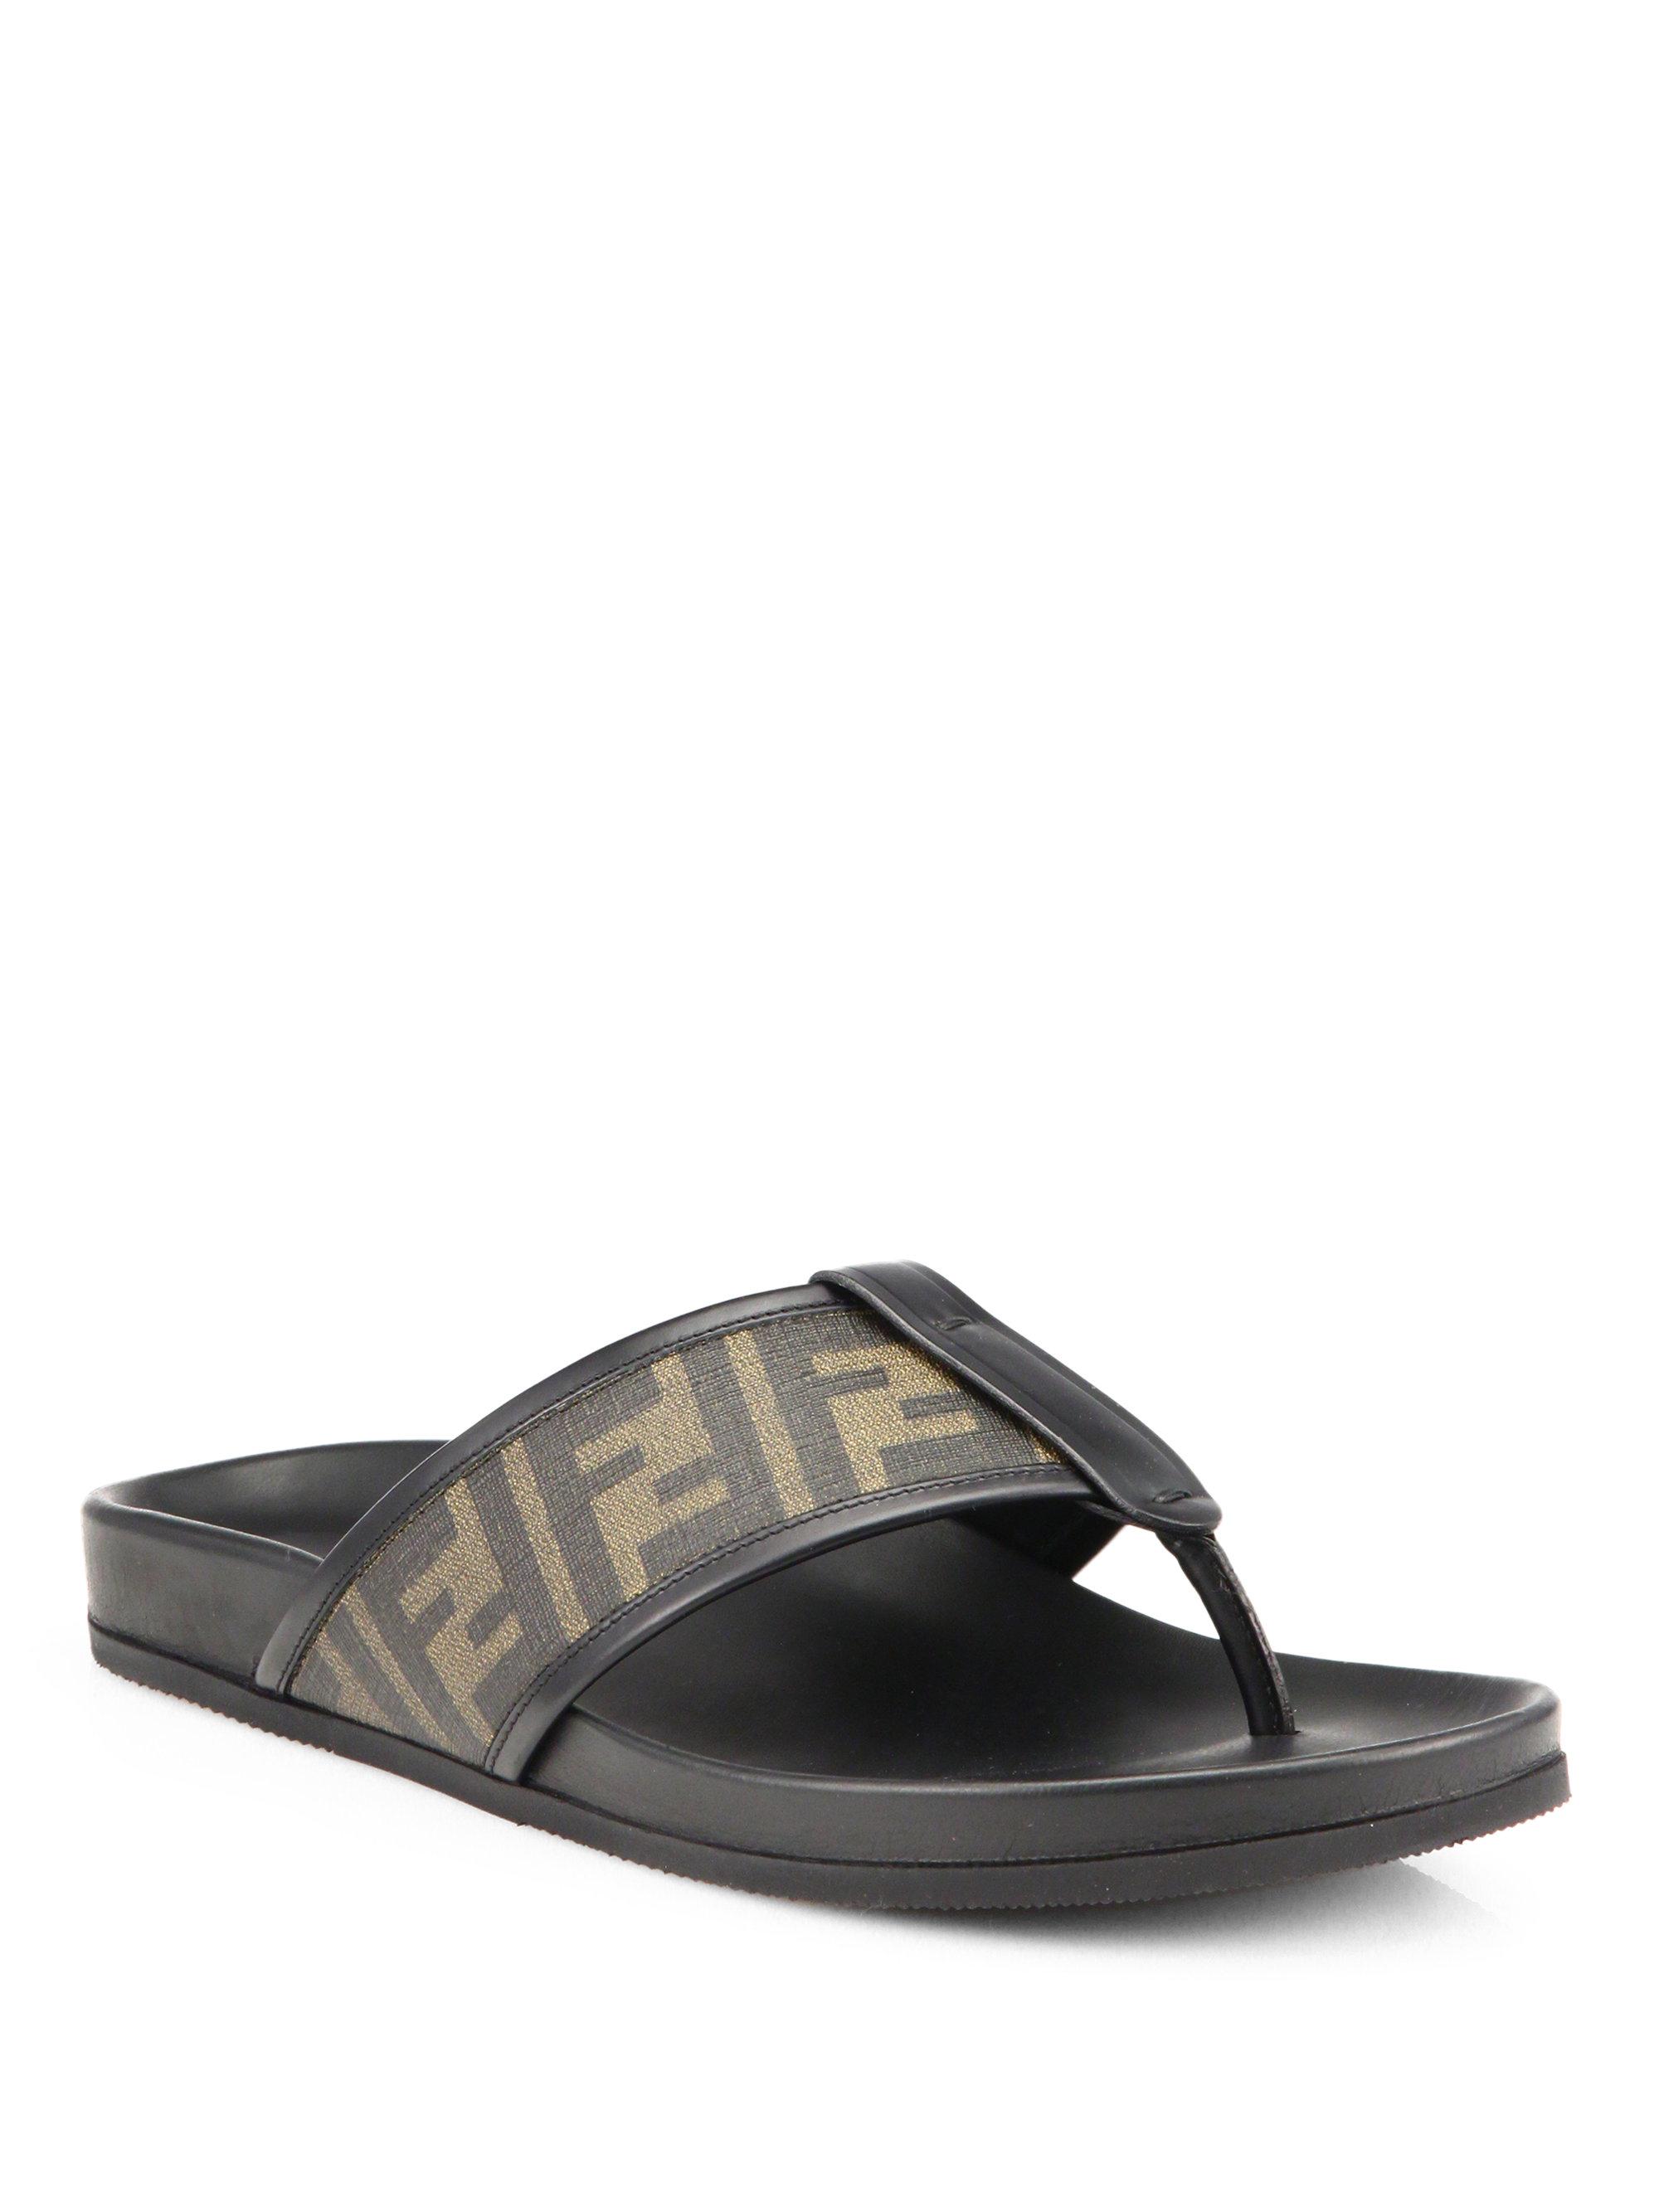 Lyst Fendi Zucca Logo Thong Sandals In Brown For Men